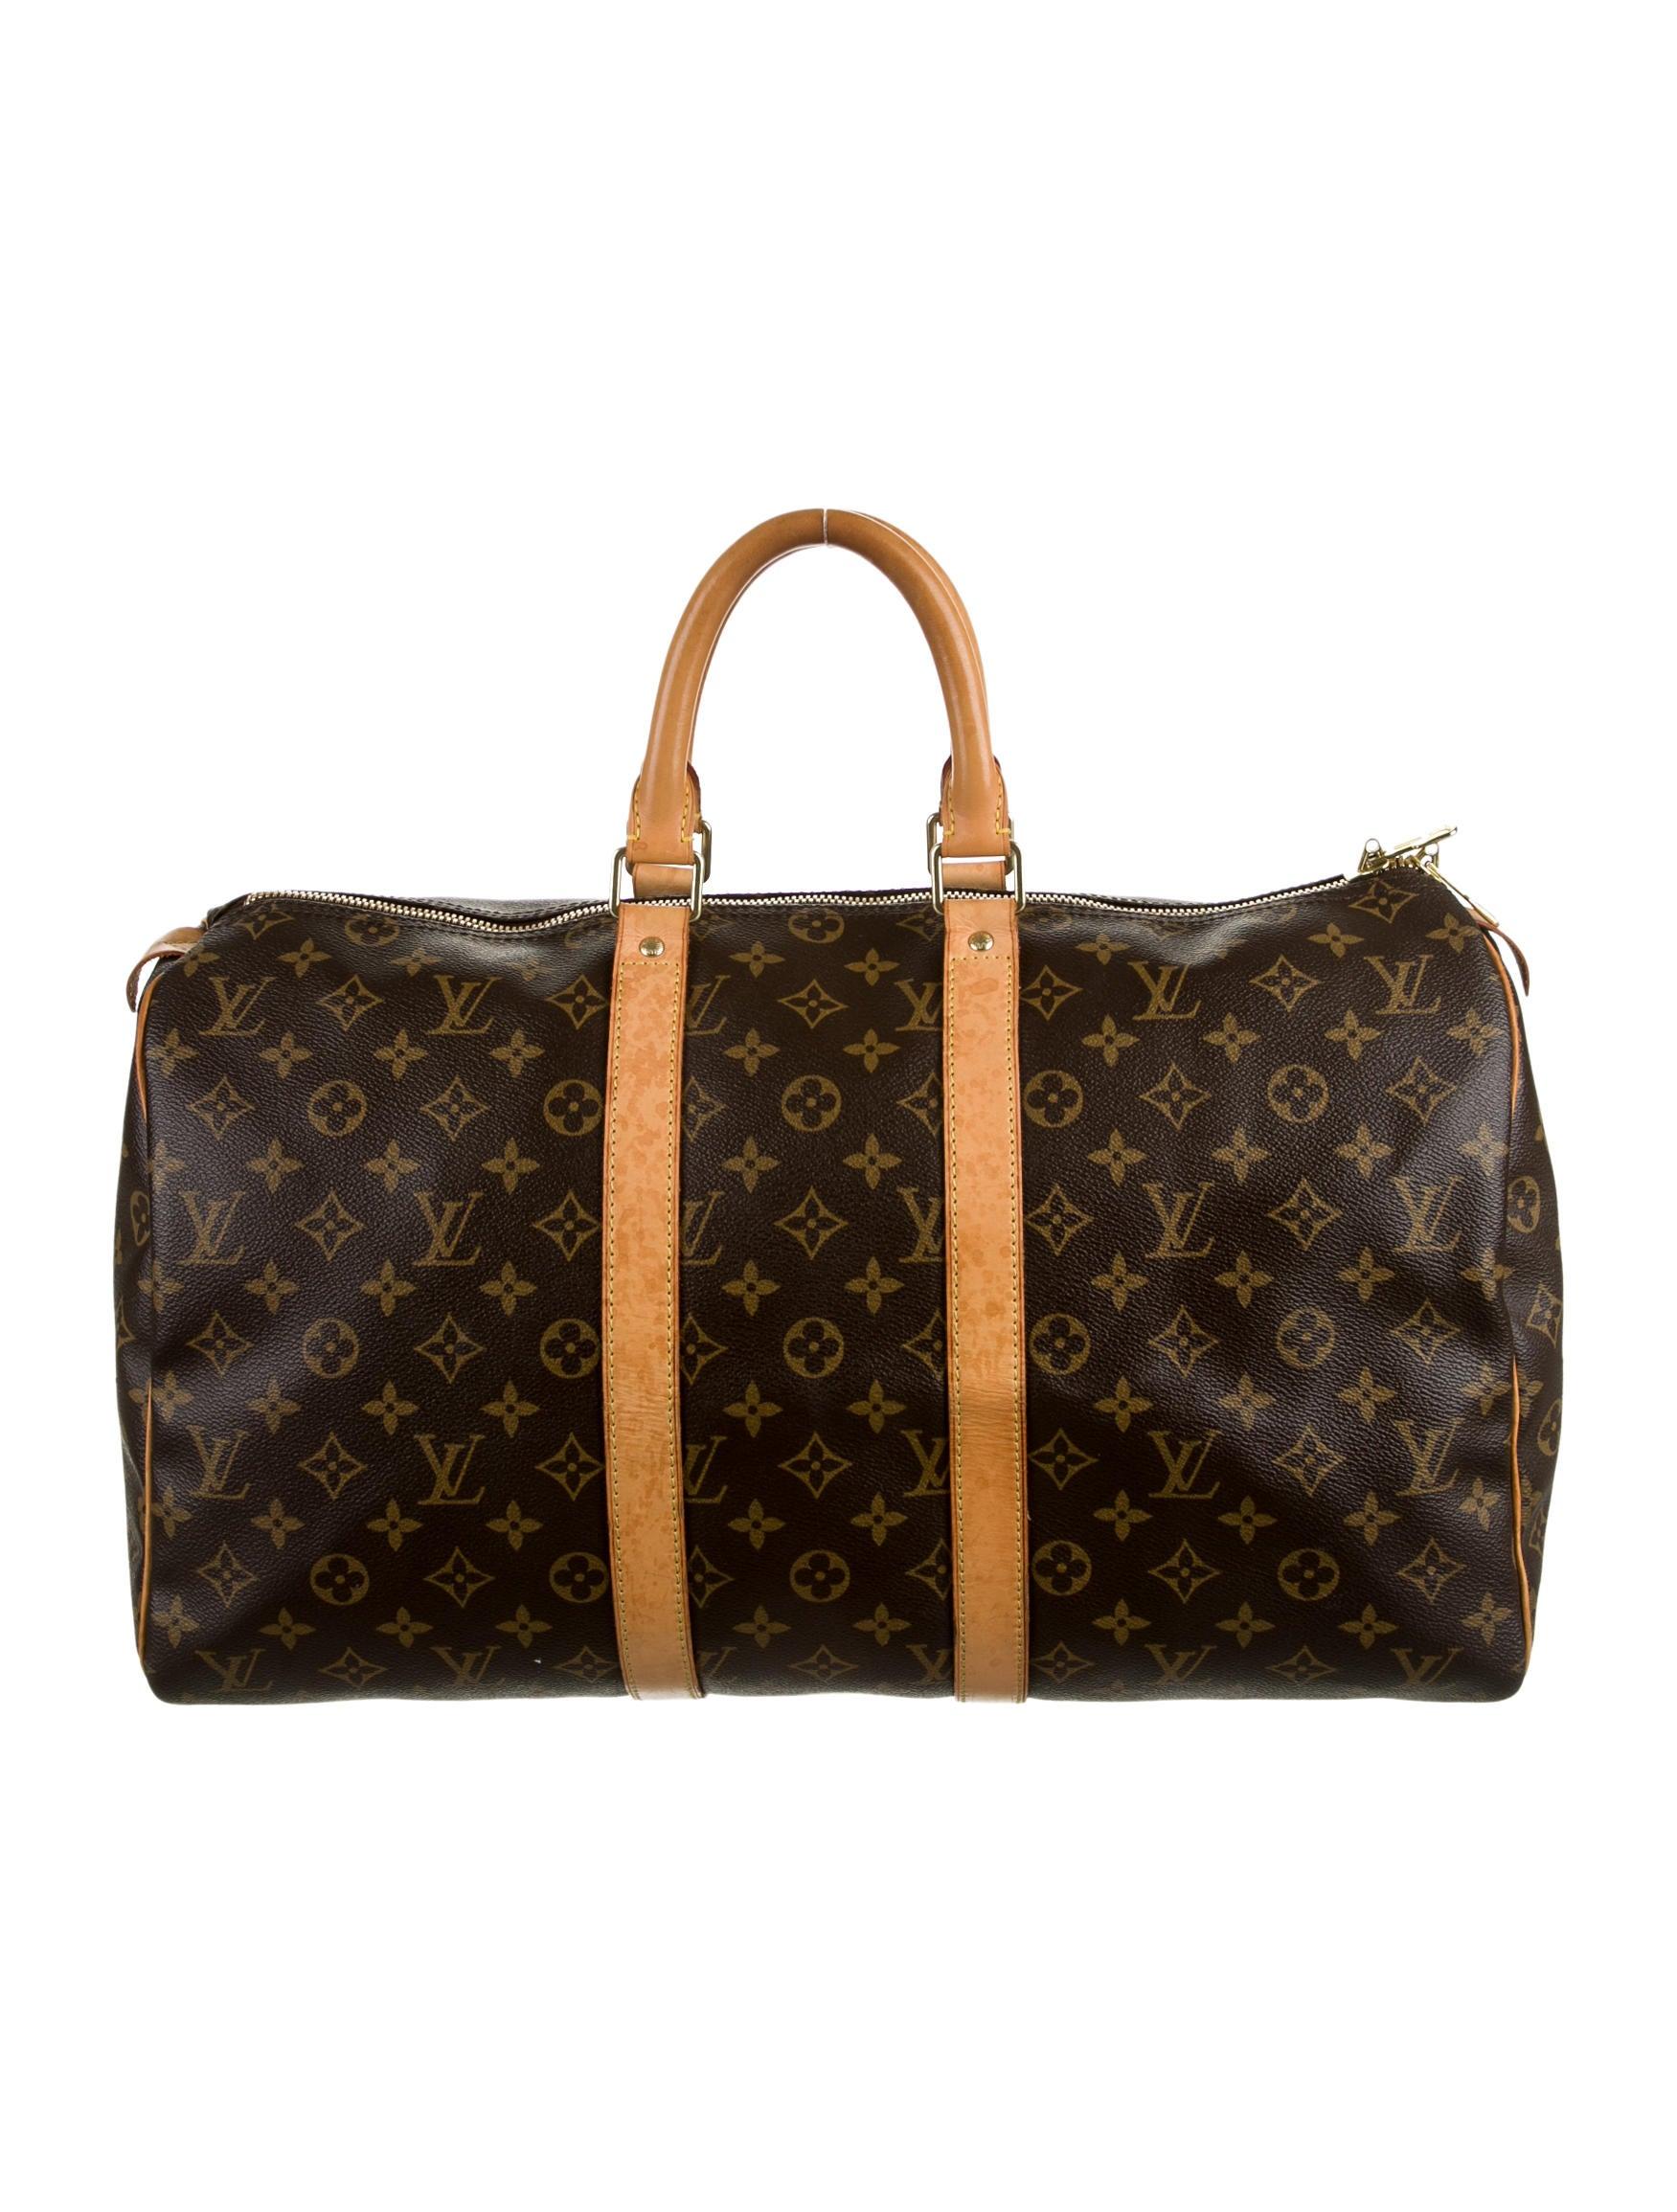 Louis Vuitton Keepall 45 - Handbags - LOU59662 | The RealReal